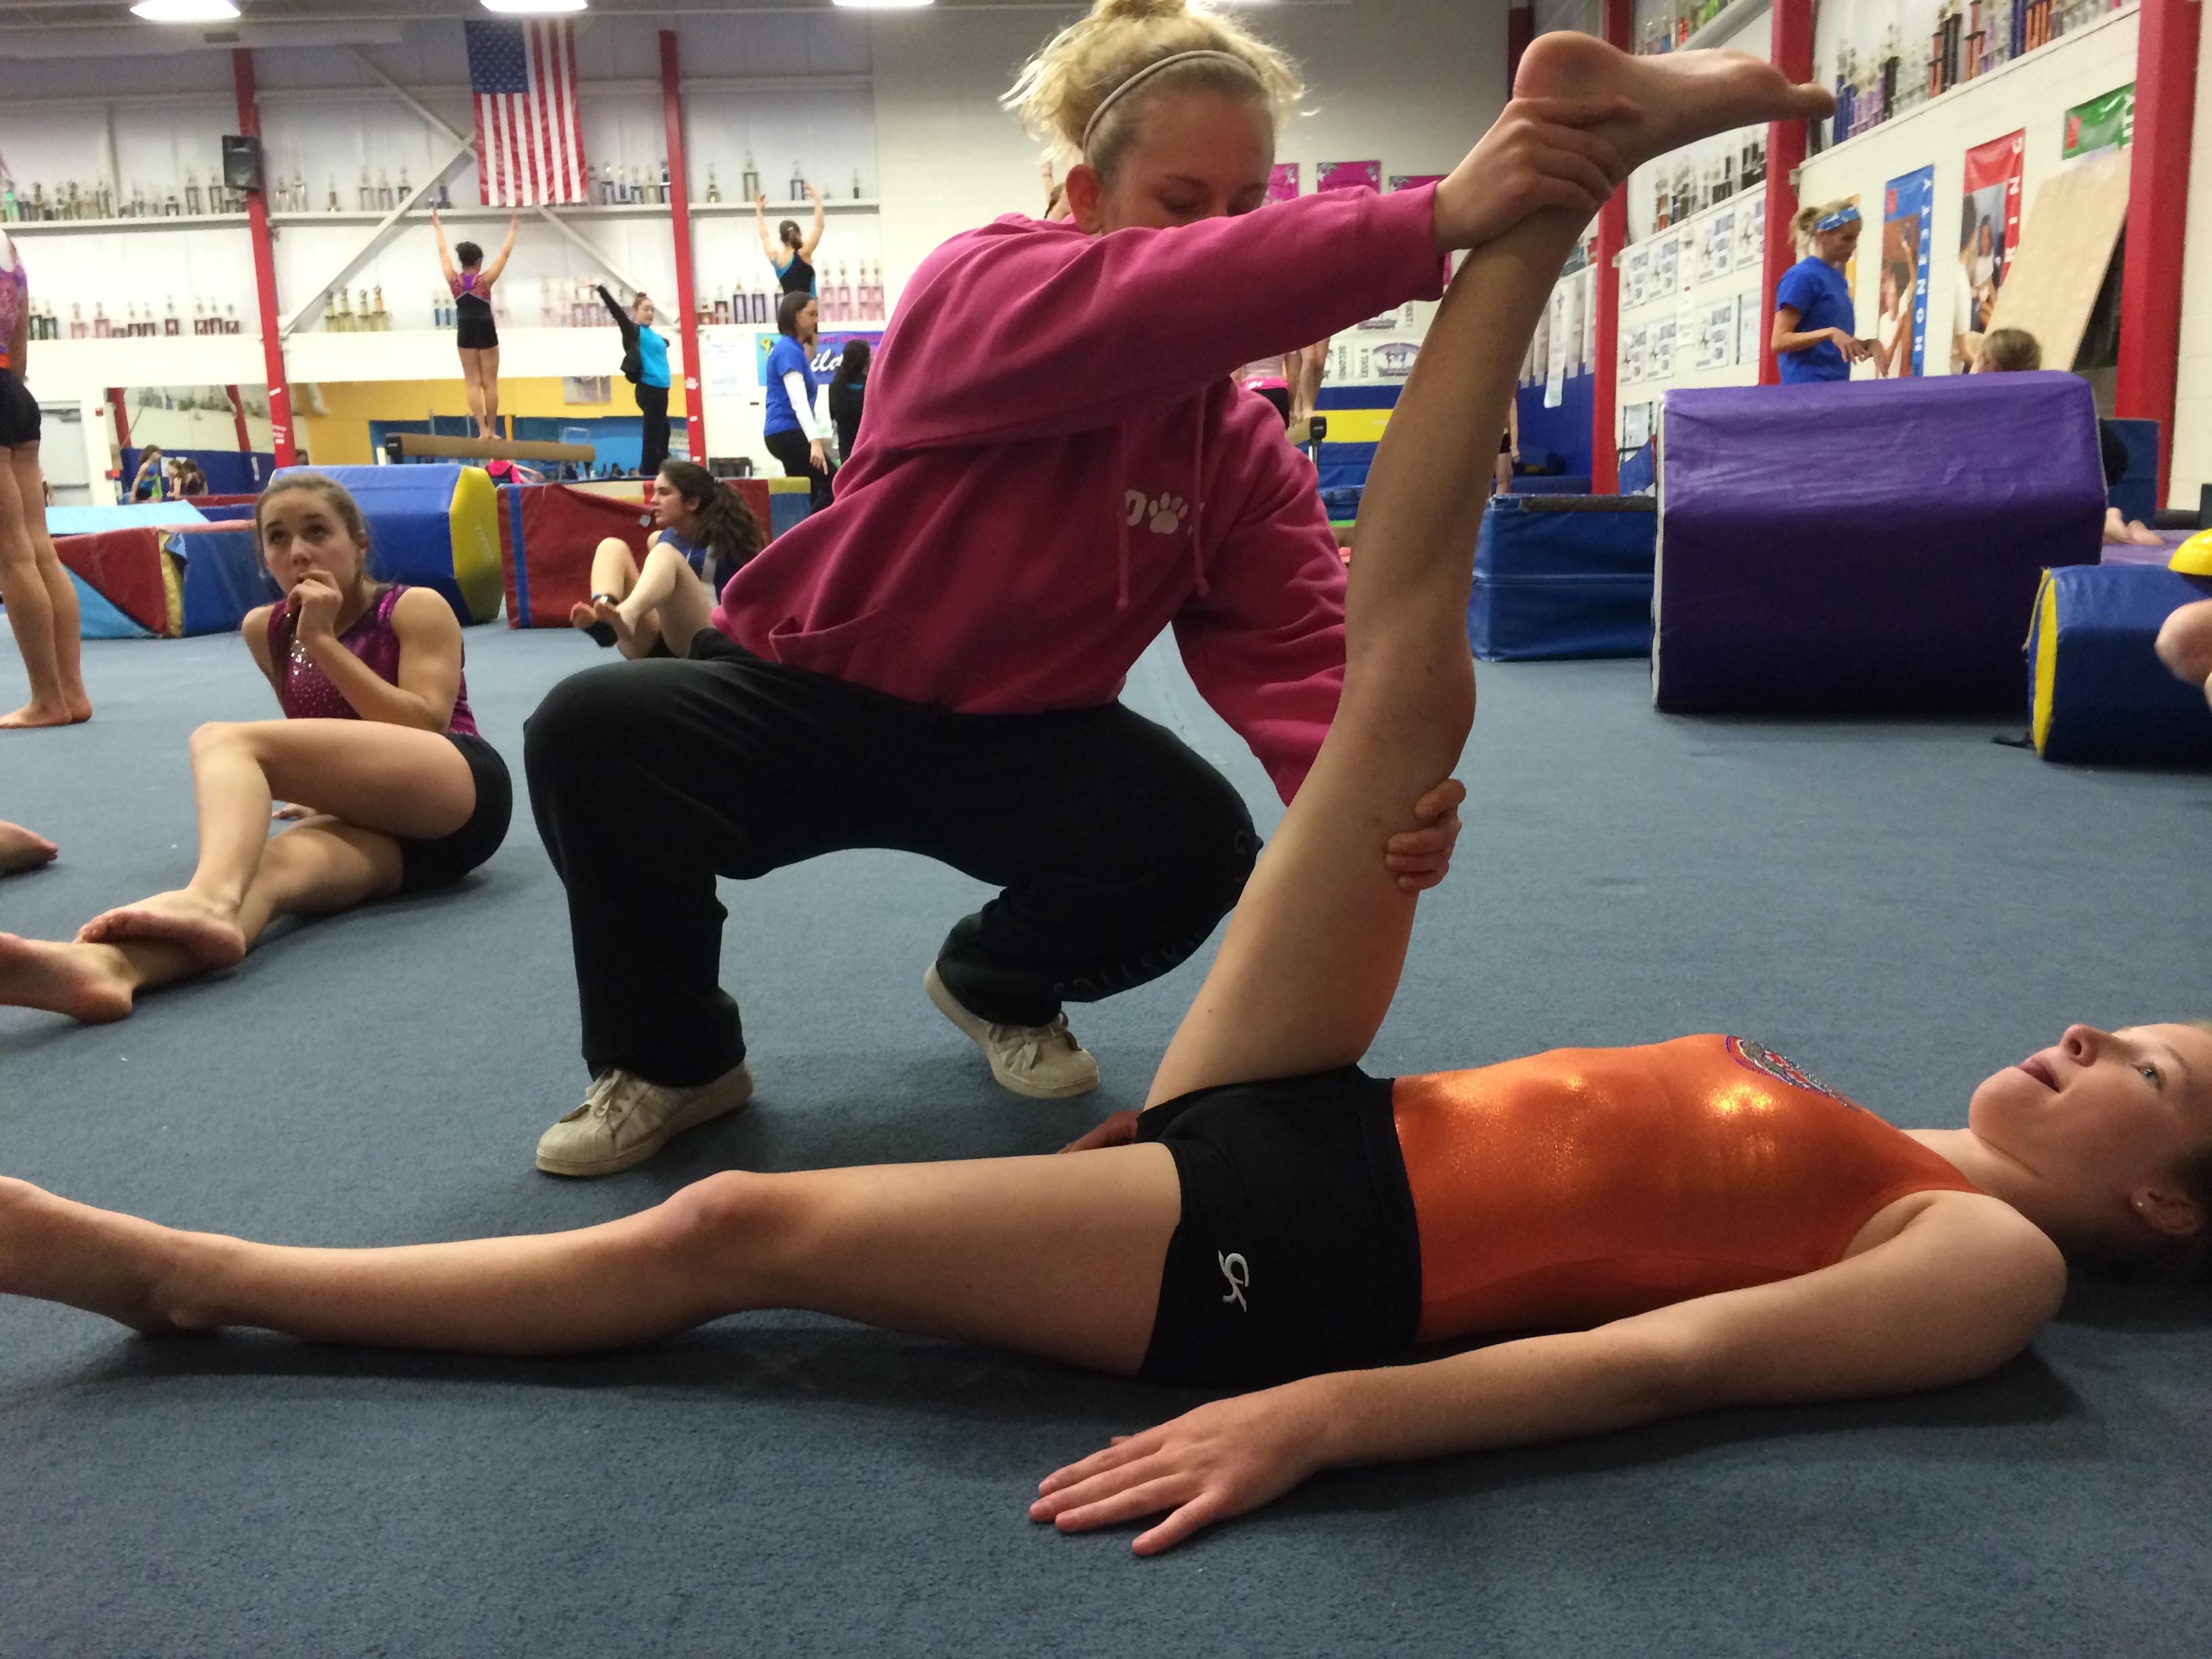 Stretching que es